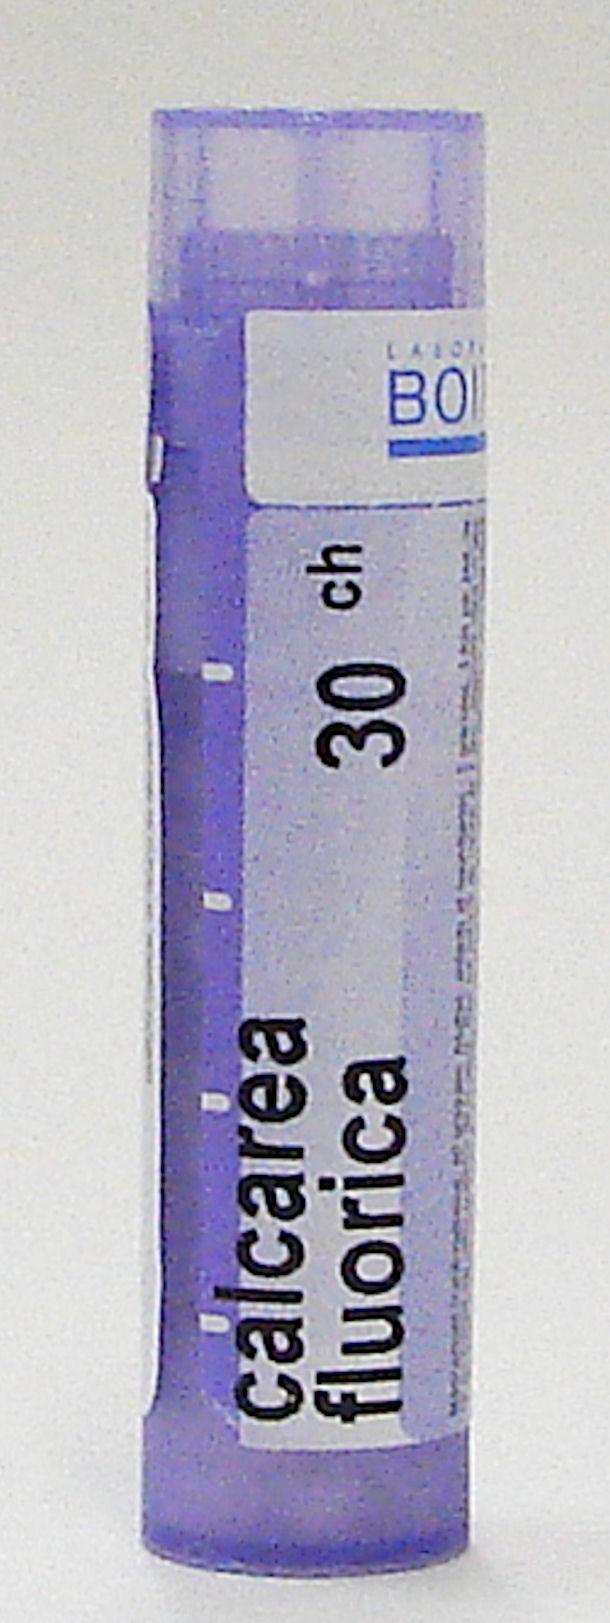 calcarea fluorica 30ch sublingual pellets (boiron)